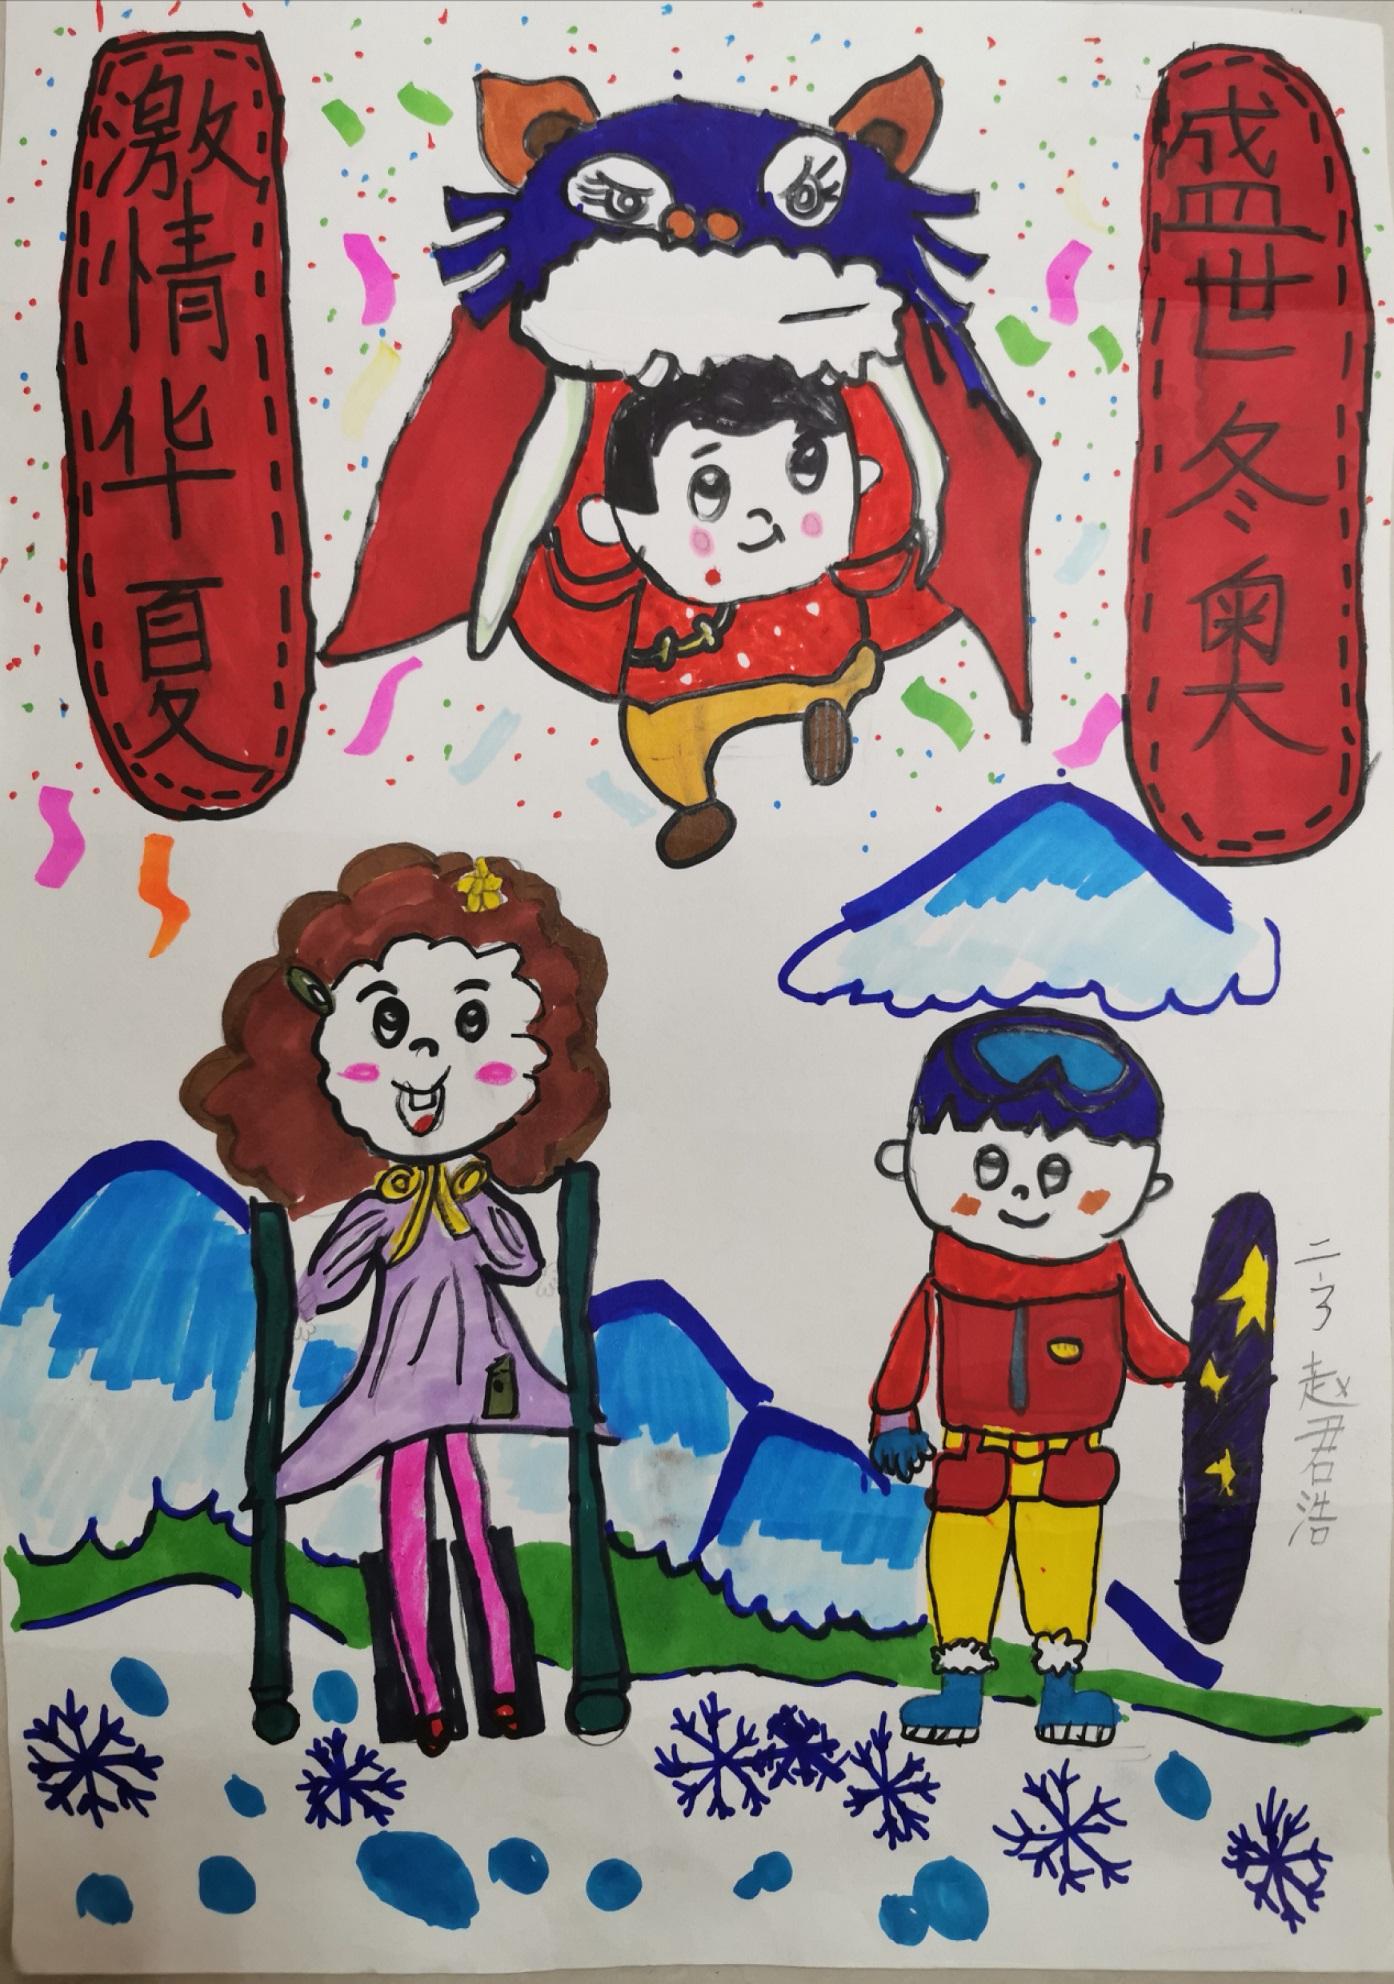 《激情华夏 盛世冬奥》 Passionate China, Flourishing Winter Olympics+赵君浩 Zhao Junhao+7+1863301147